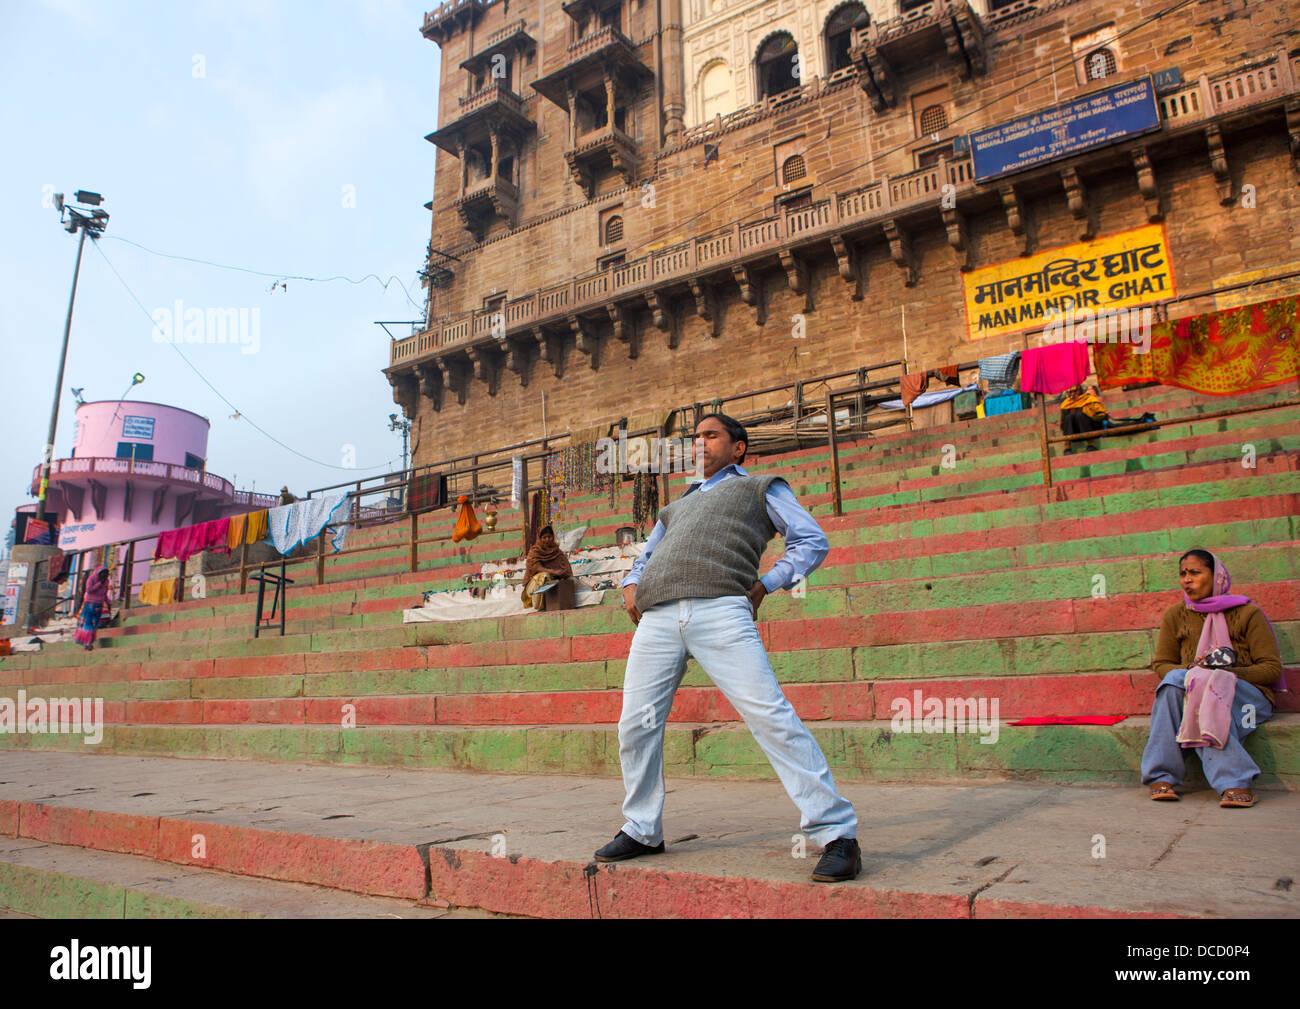 Hombre indio haciendo gimnasia en Manmandir Ghat, Varanasi, India Imagen De Stock